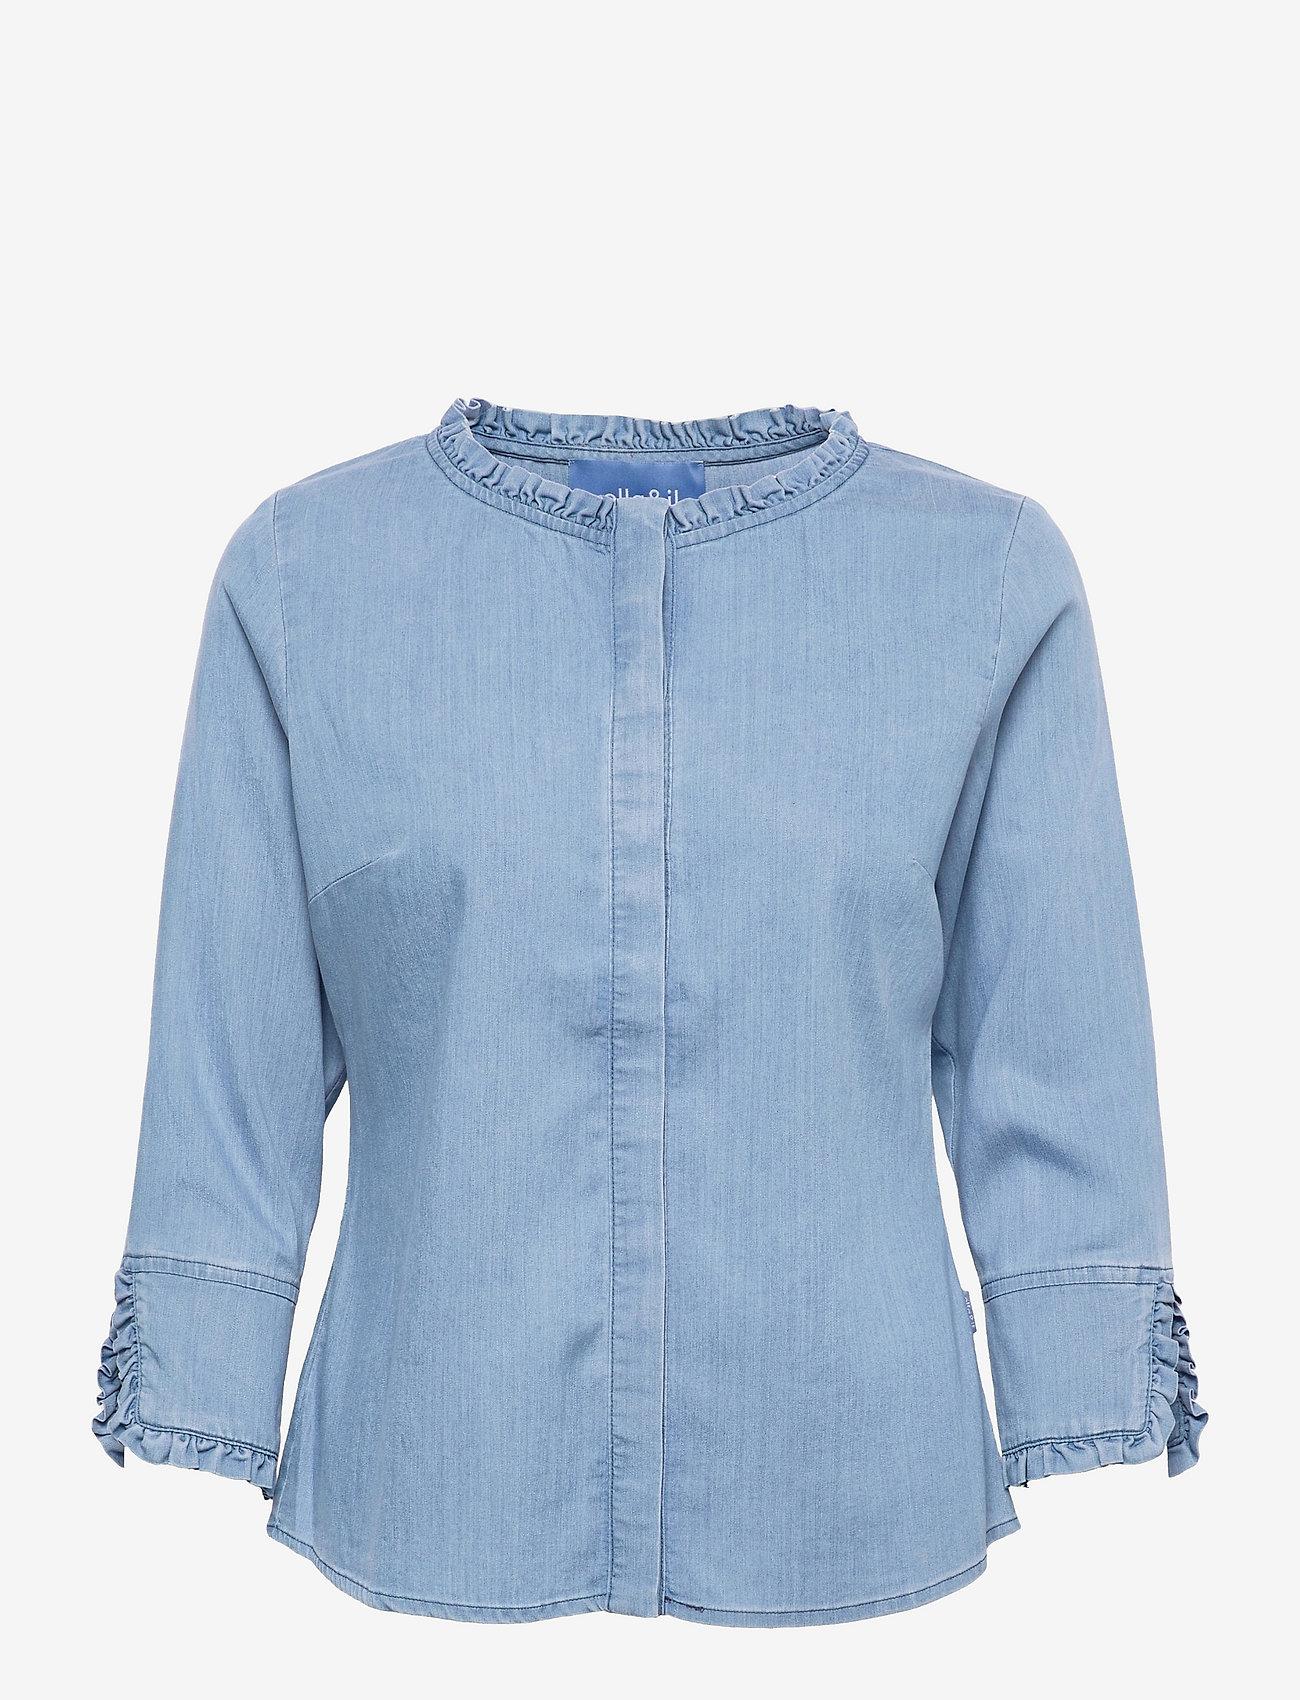 ella&il - Clara denim shirt - chemises en jeans - blue denim - 0